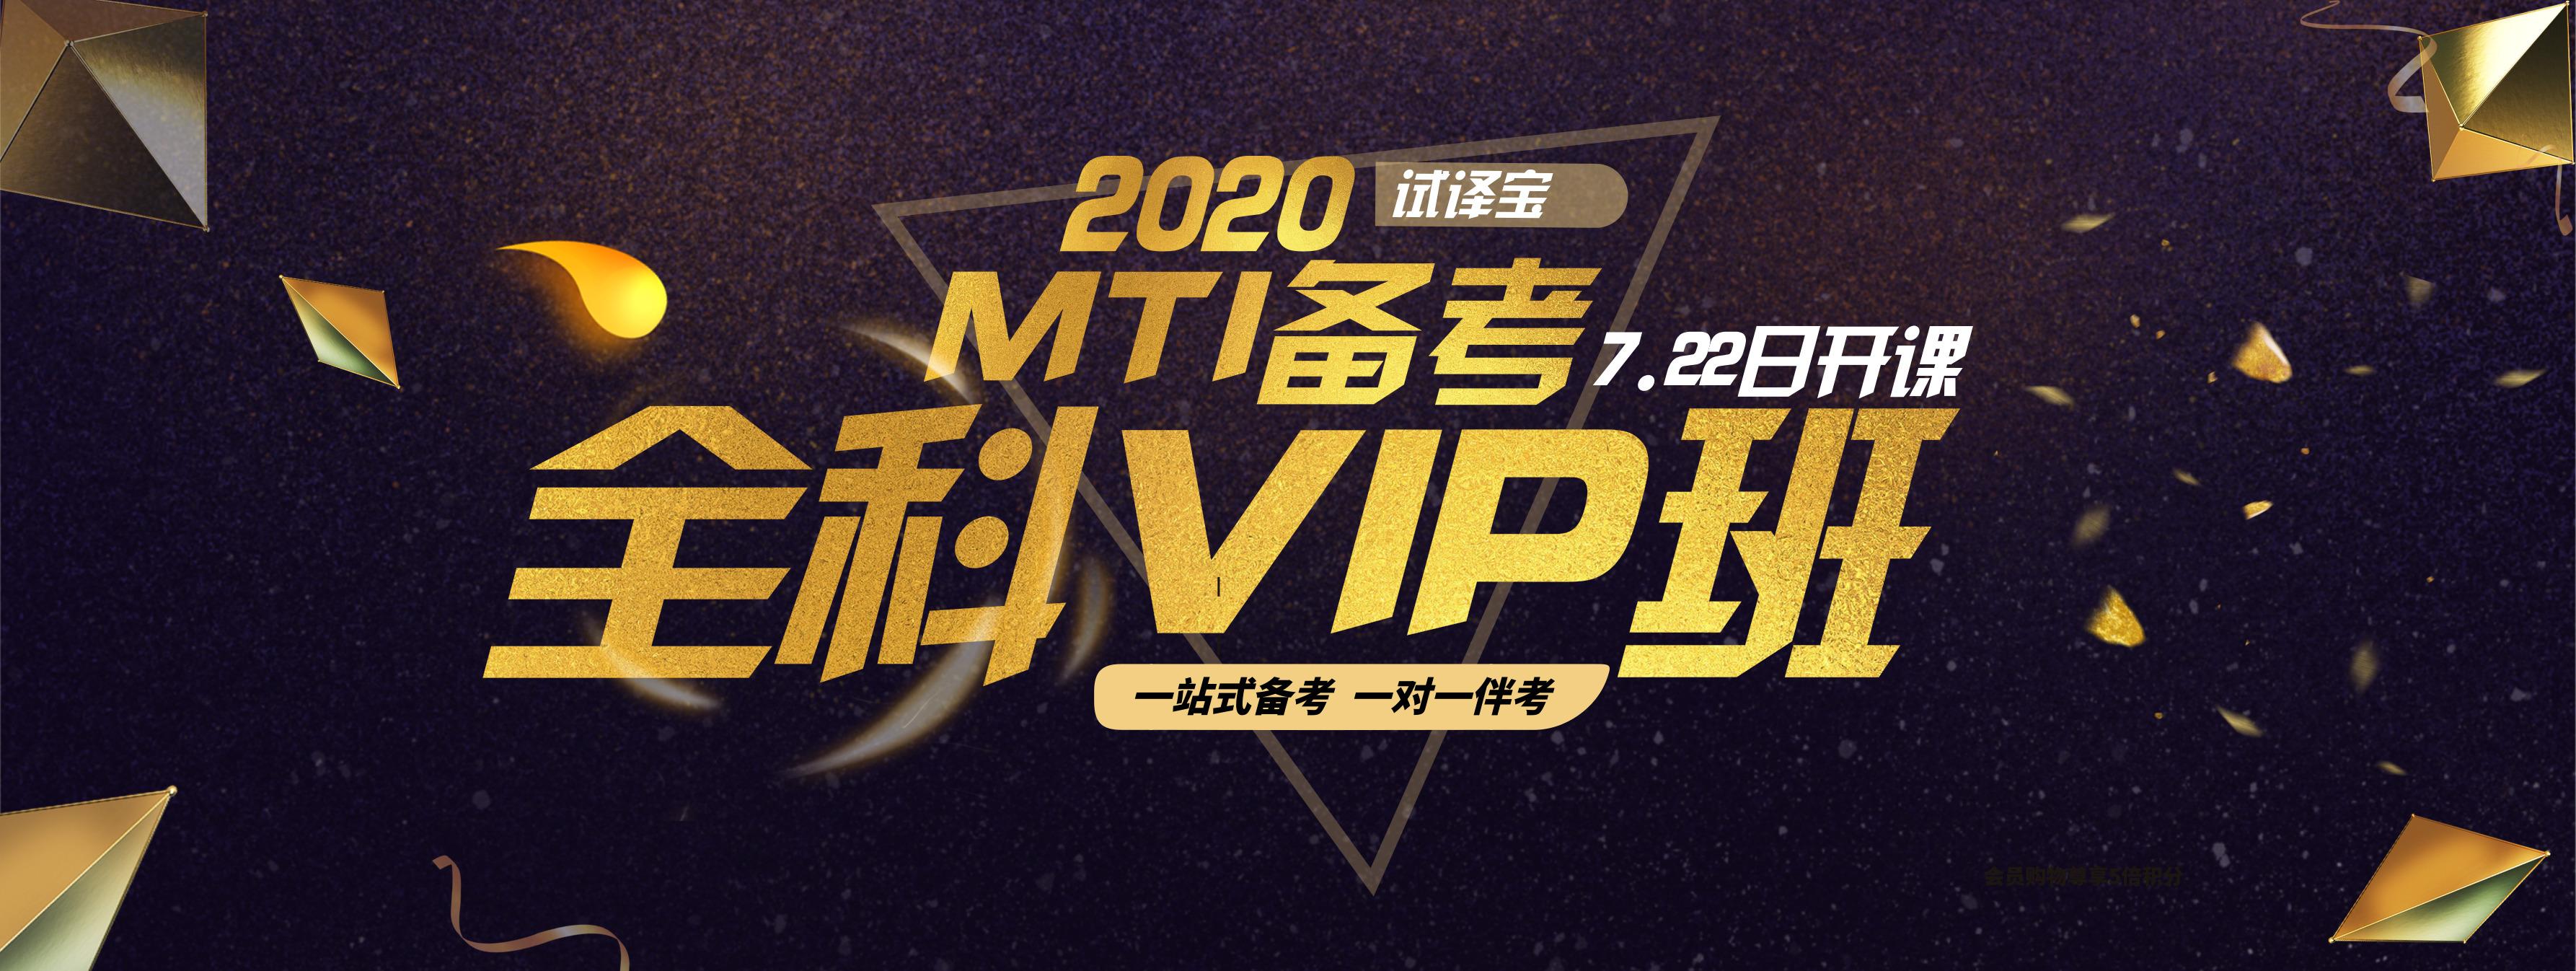 2020MIT备考全科VIP班